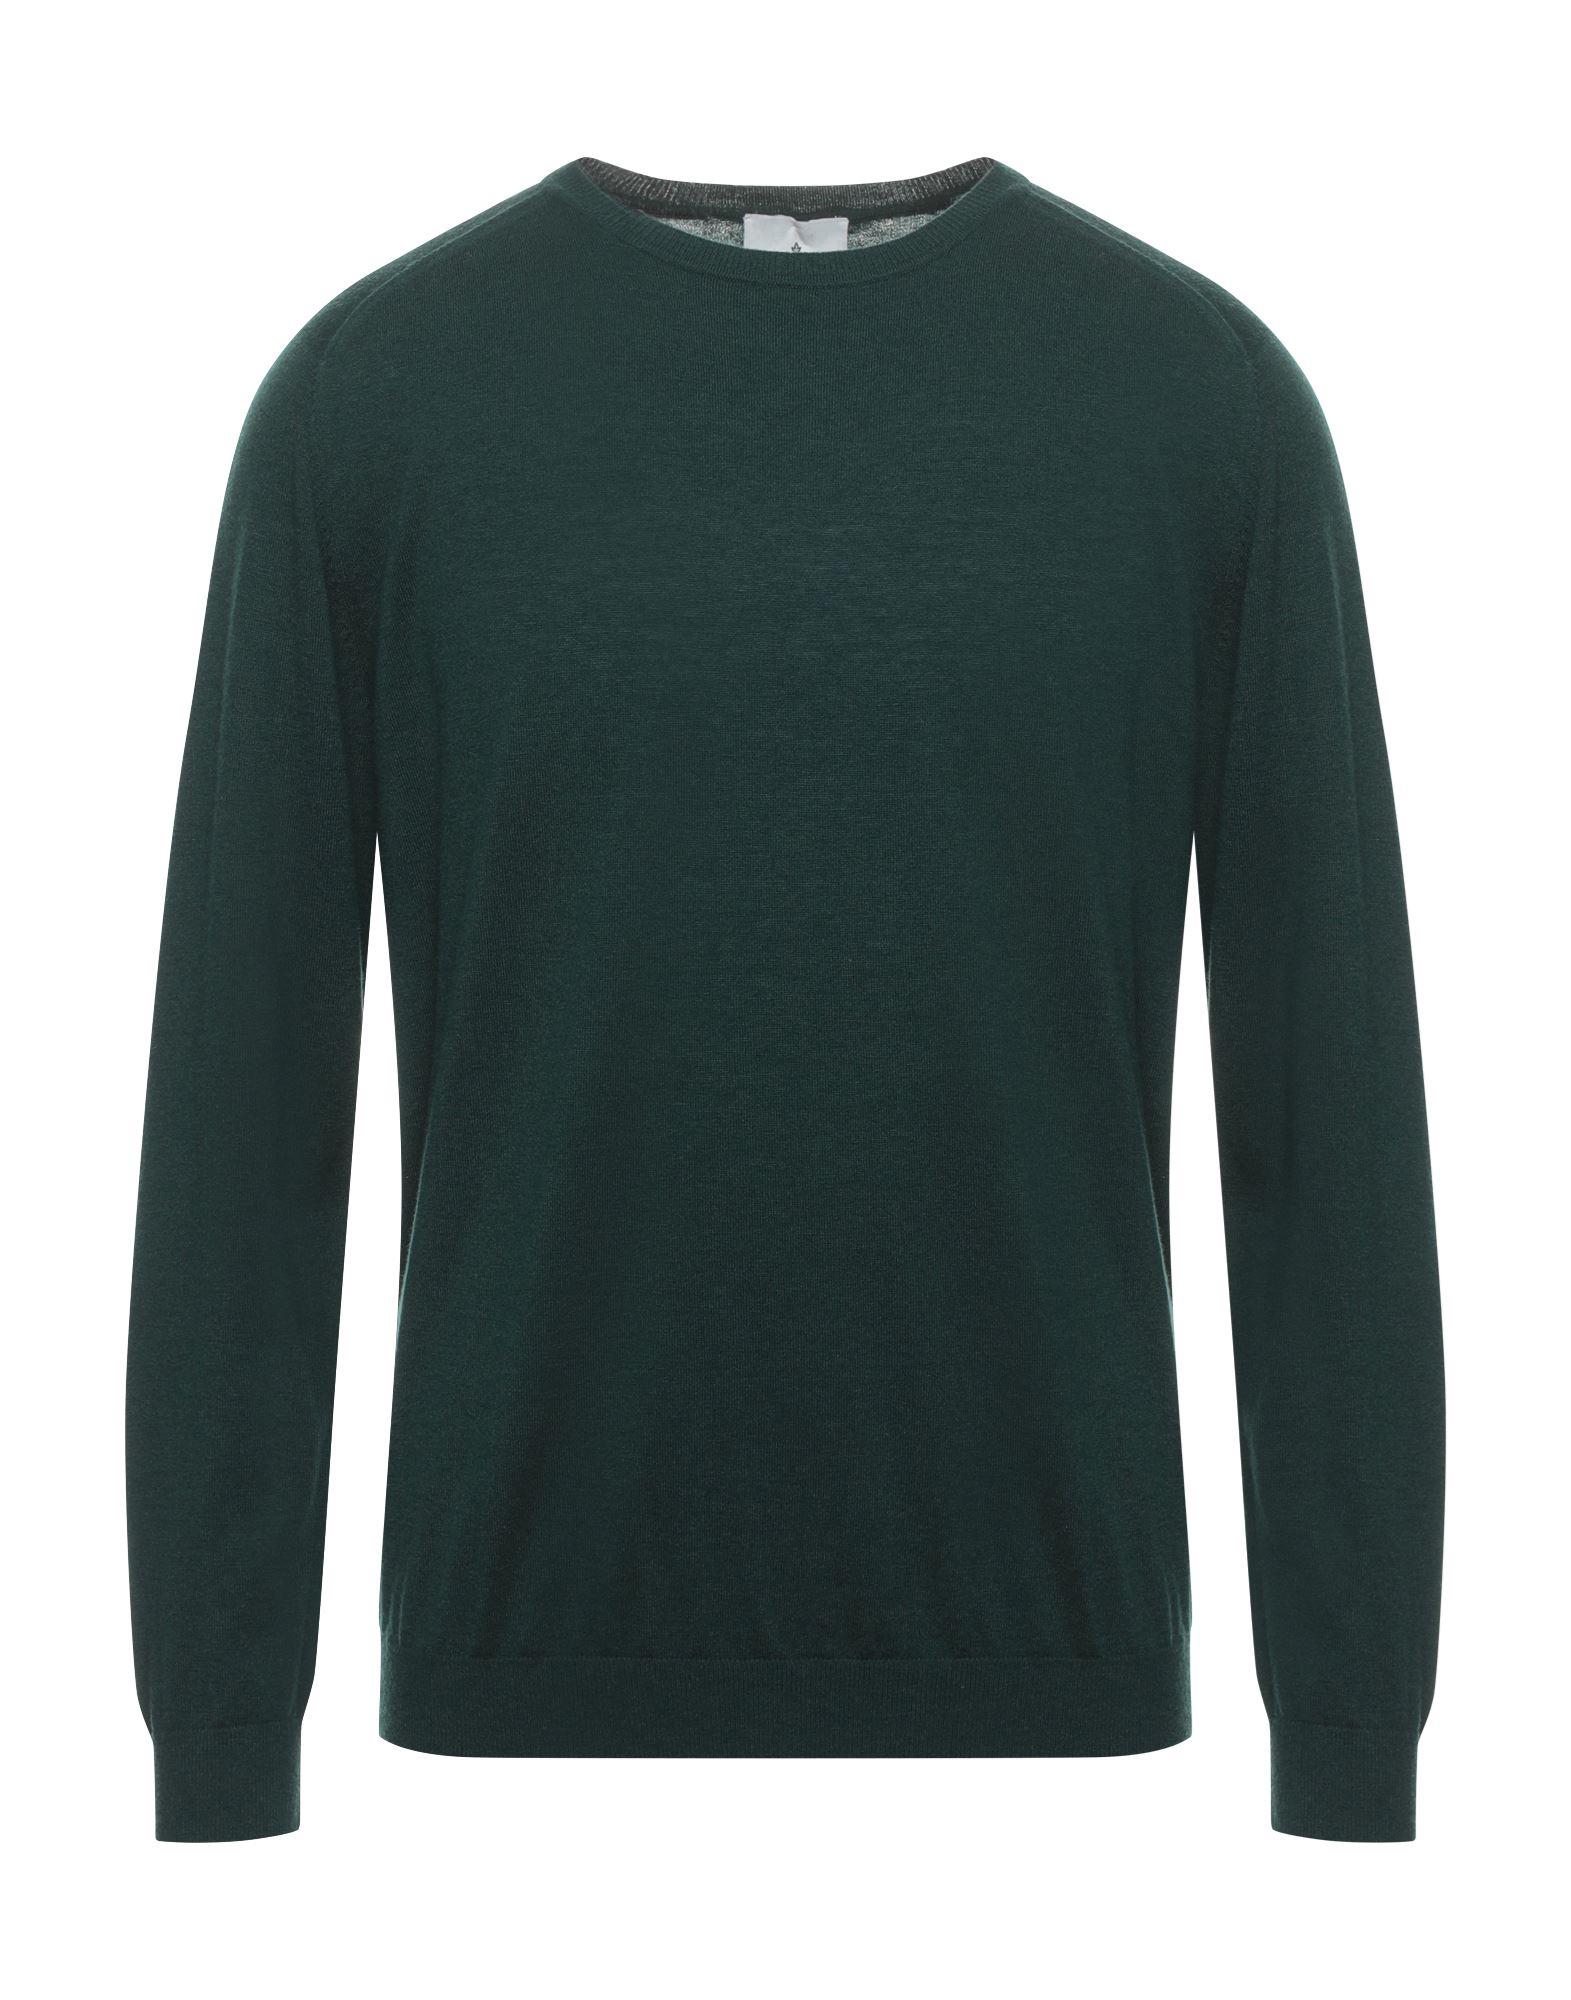 Diktat Sweaters In Green